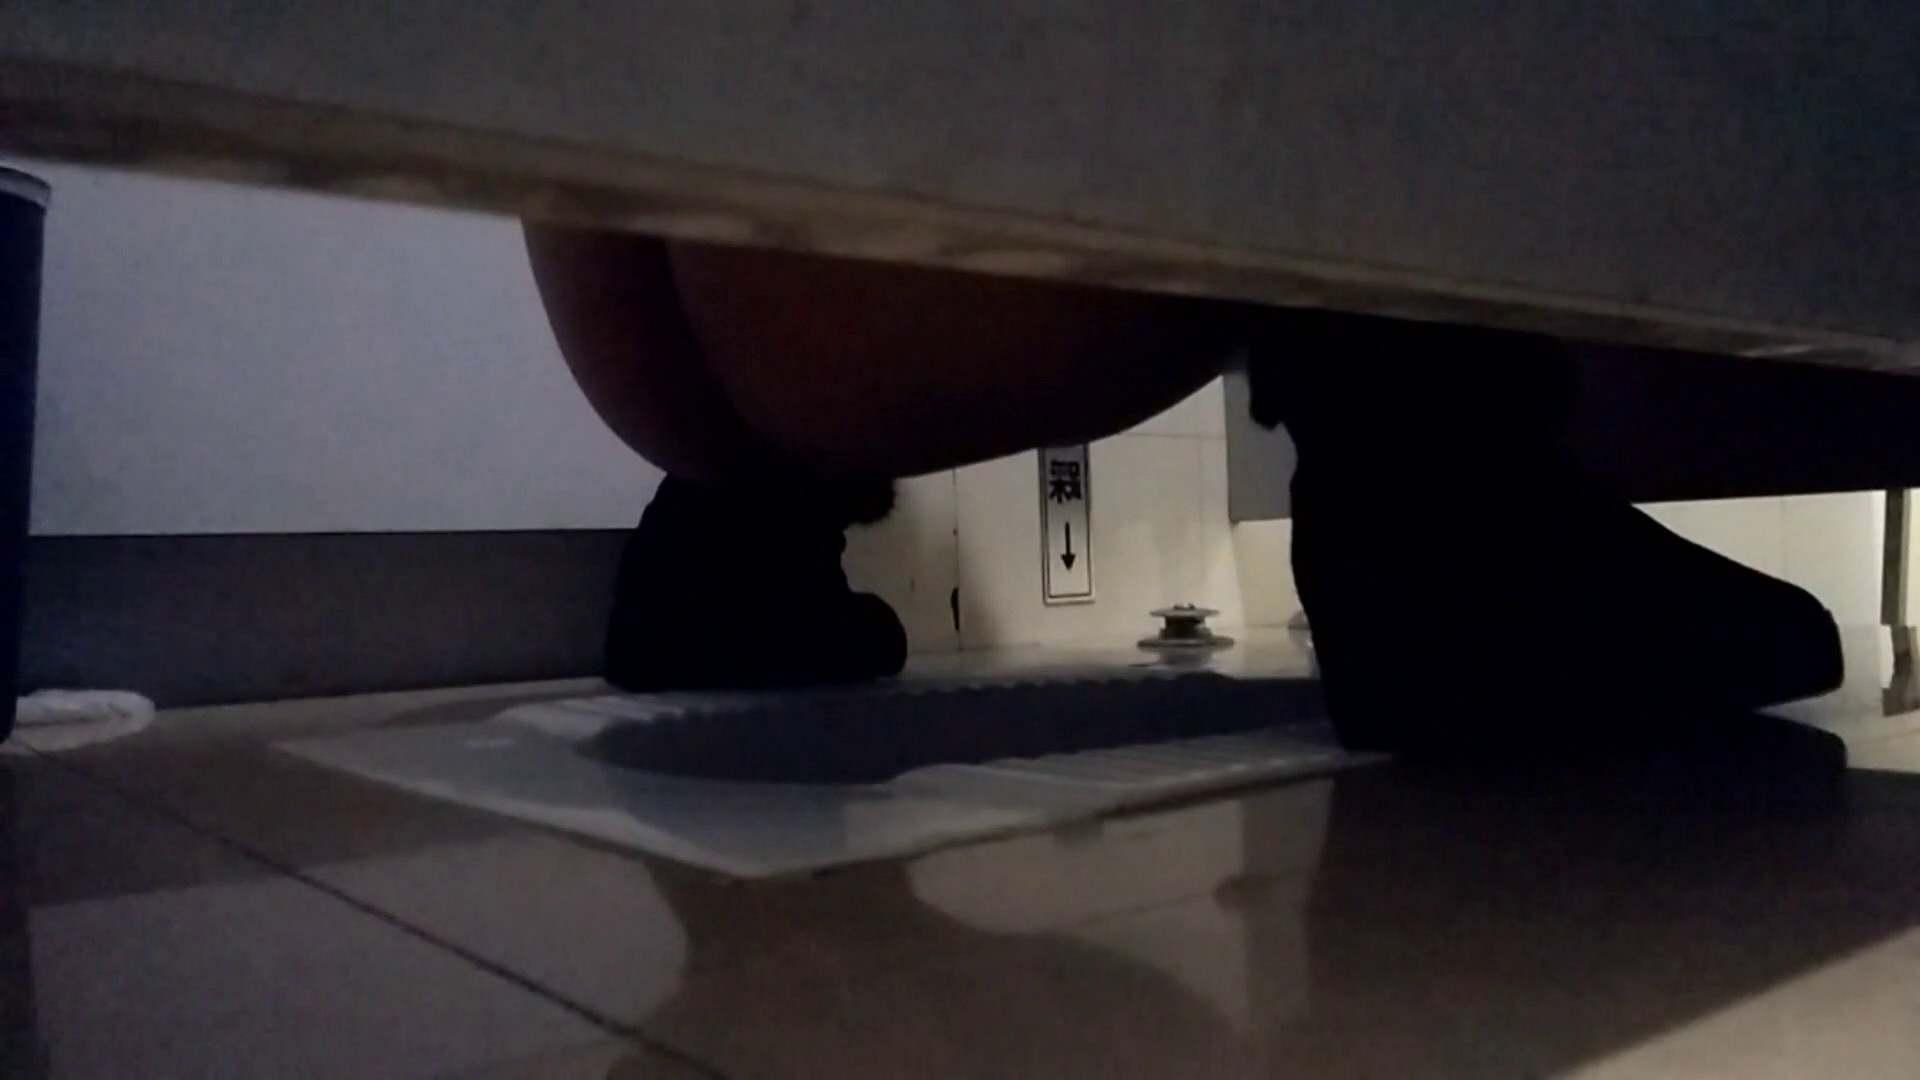 芸術大学ガチ潜入盗撮 JD盗撮 美女の洗面所の秘密 Vol.99 高画質 スケベ動画紹介 88画像 73